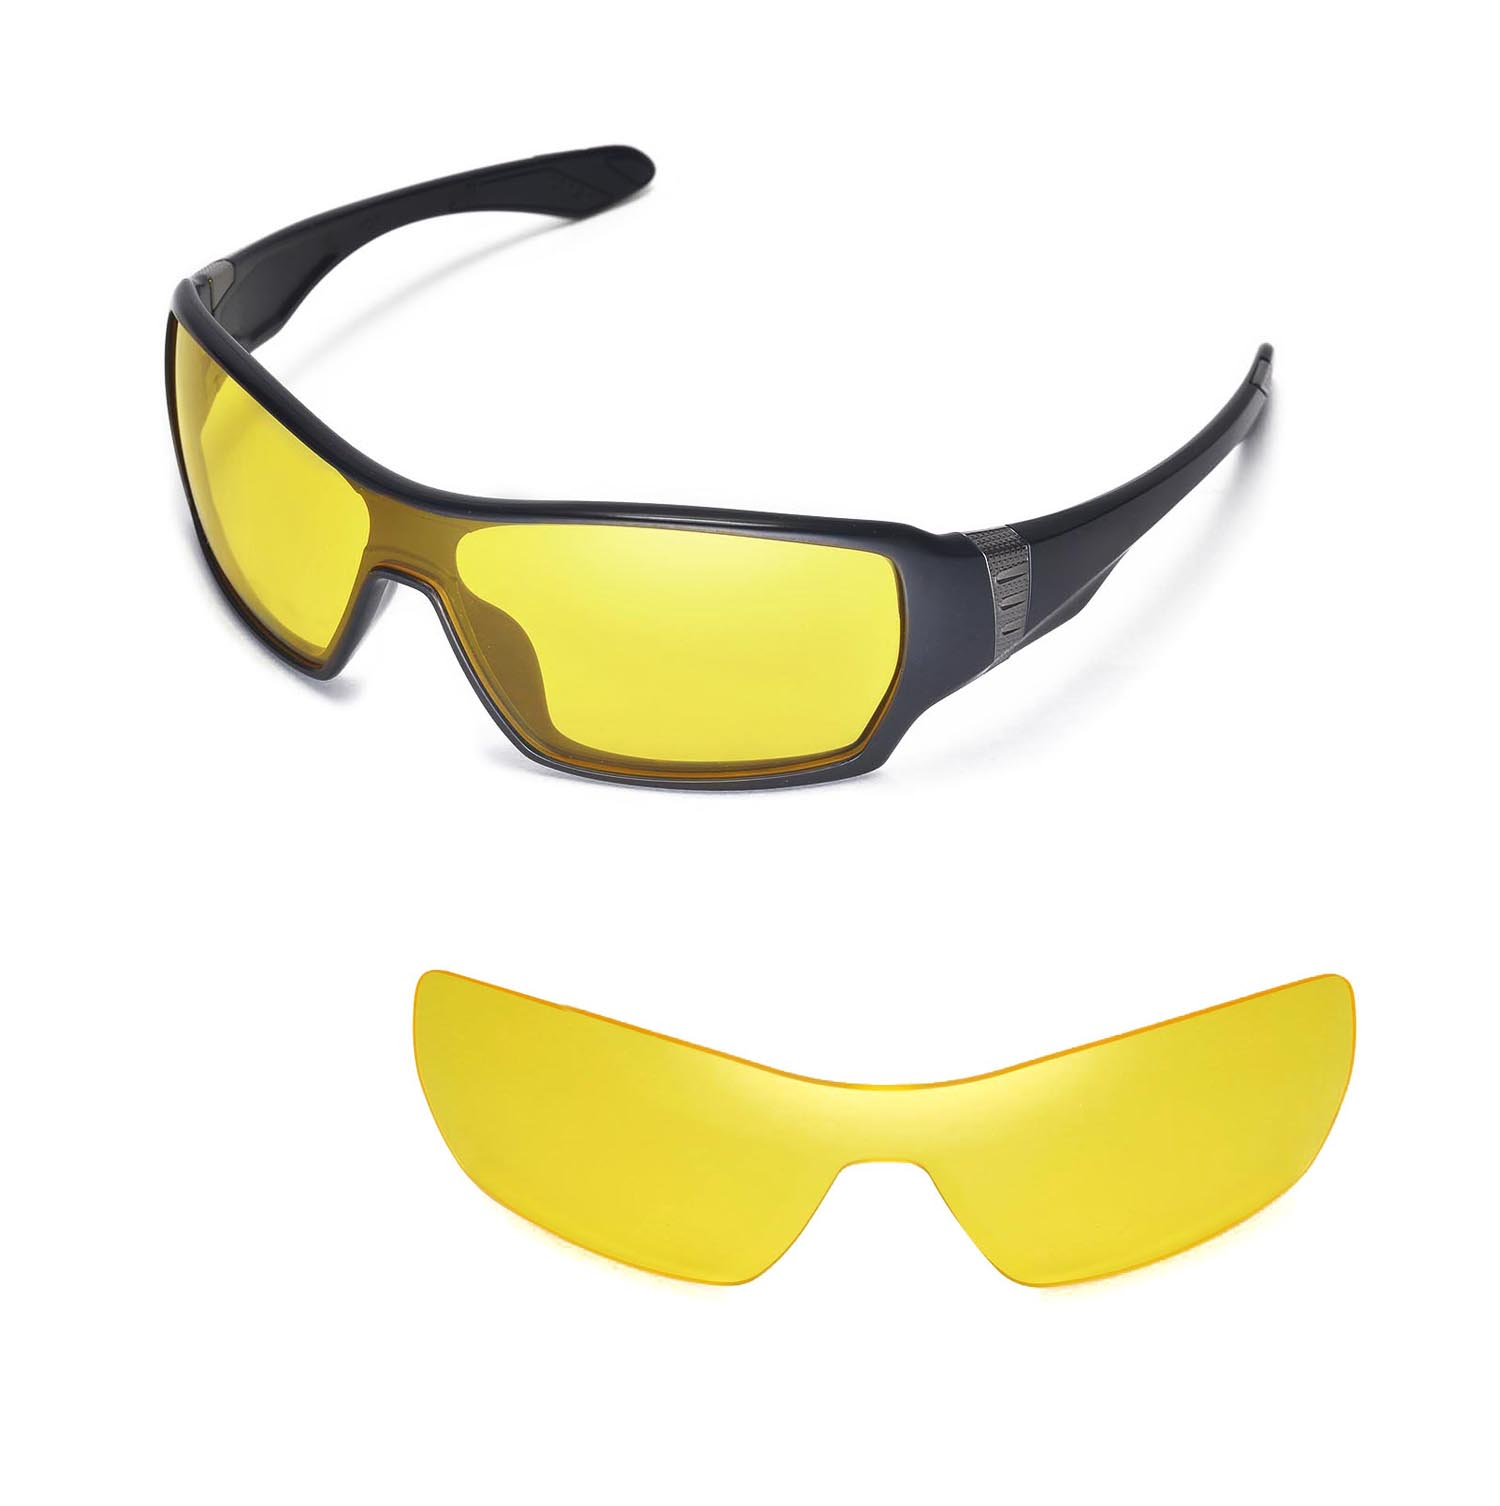 b4273d1bc0 Walleva Yellow Lenses for Oakley Offshoot x1  Walleva Microfiber Lens  Cleaning Cloth x1